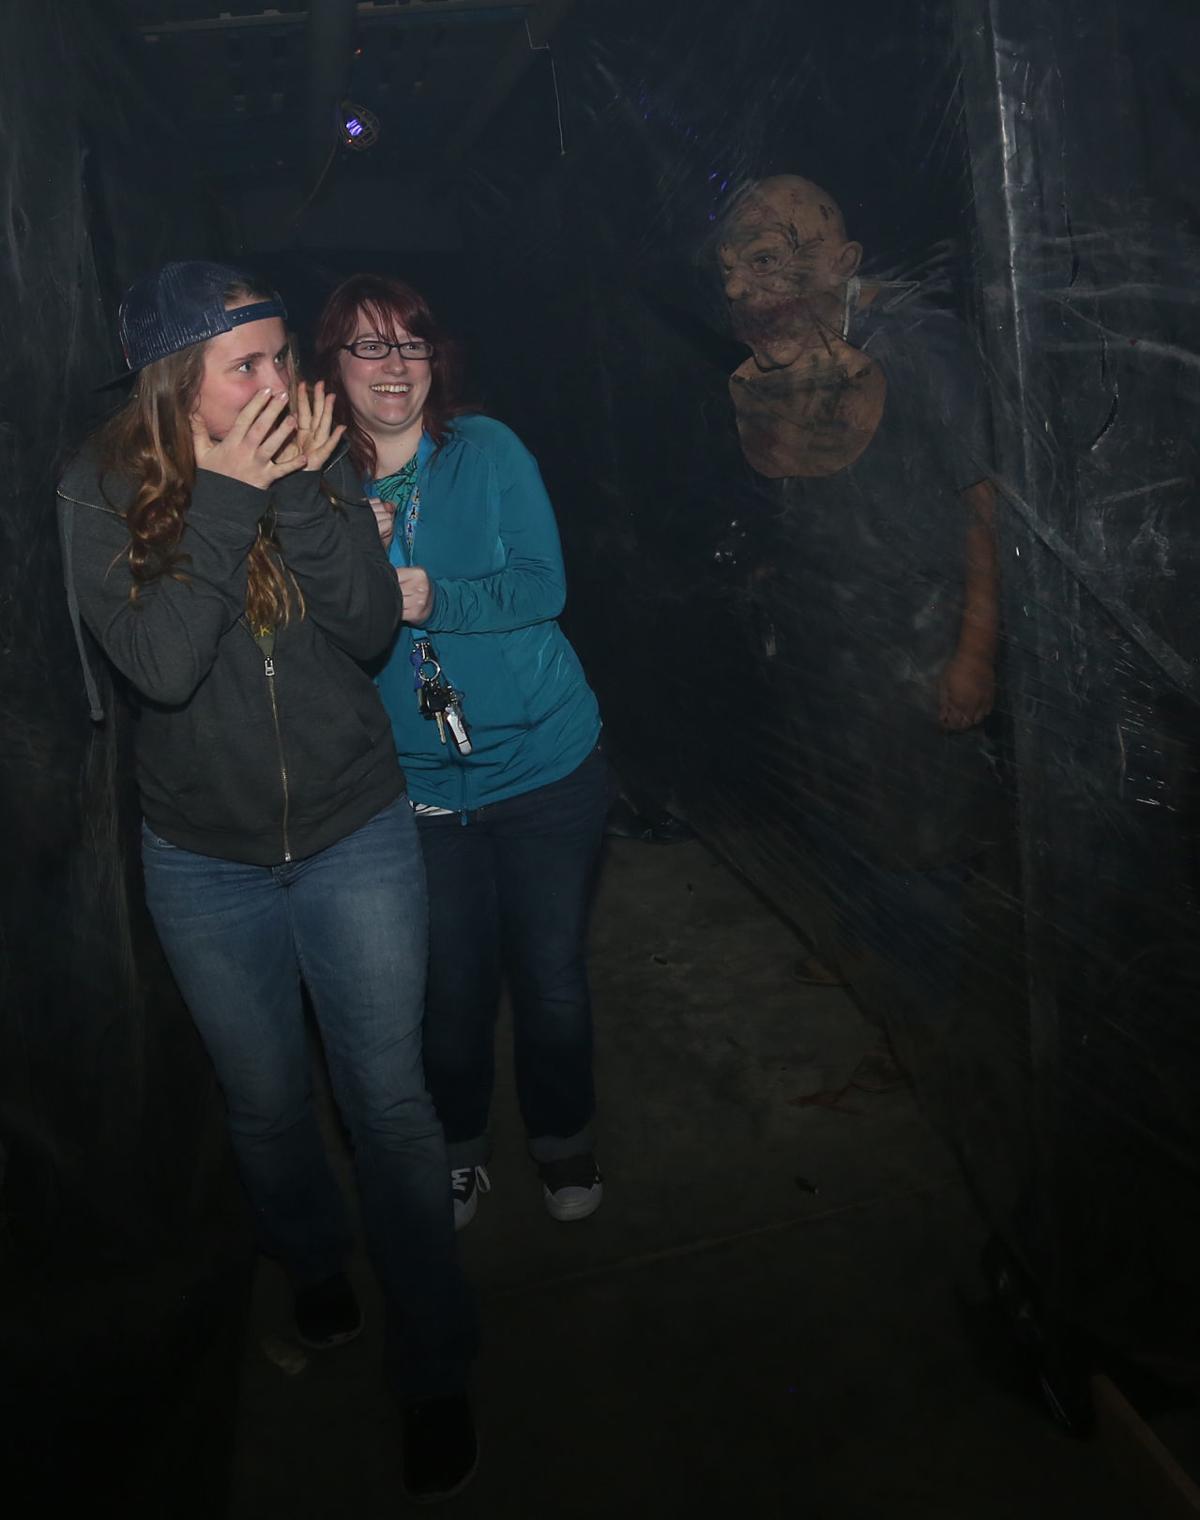 casper movie house. Haunted House 1 Casper Movie